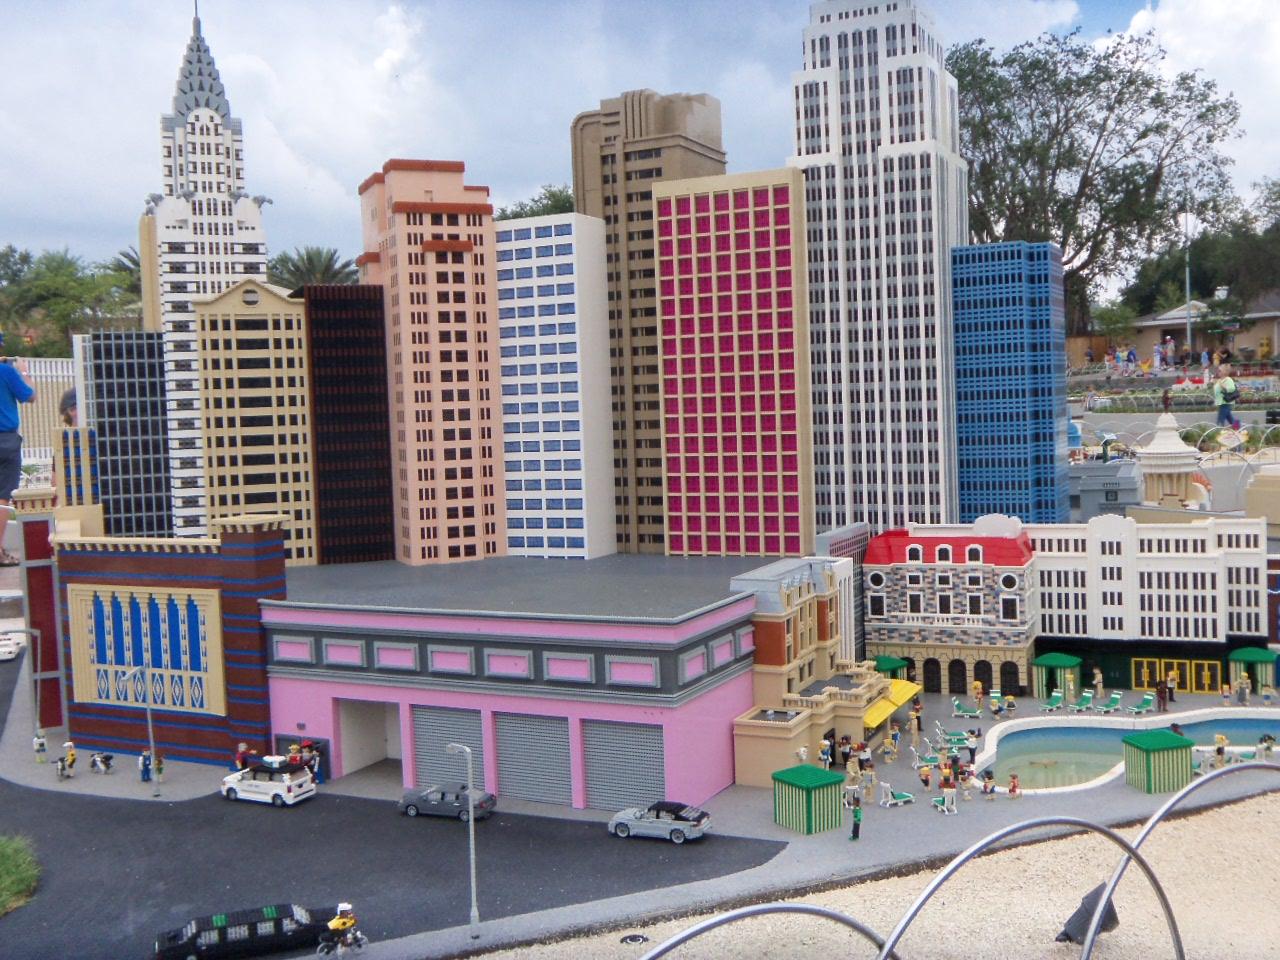 New York en miniatura